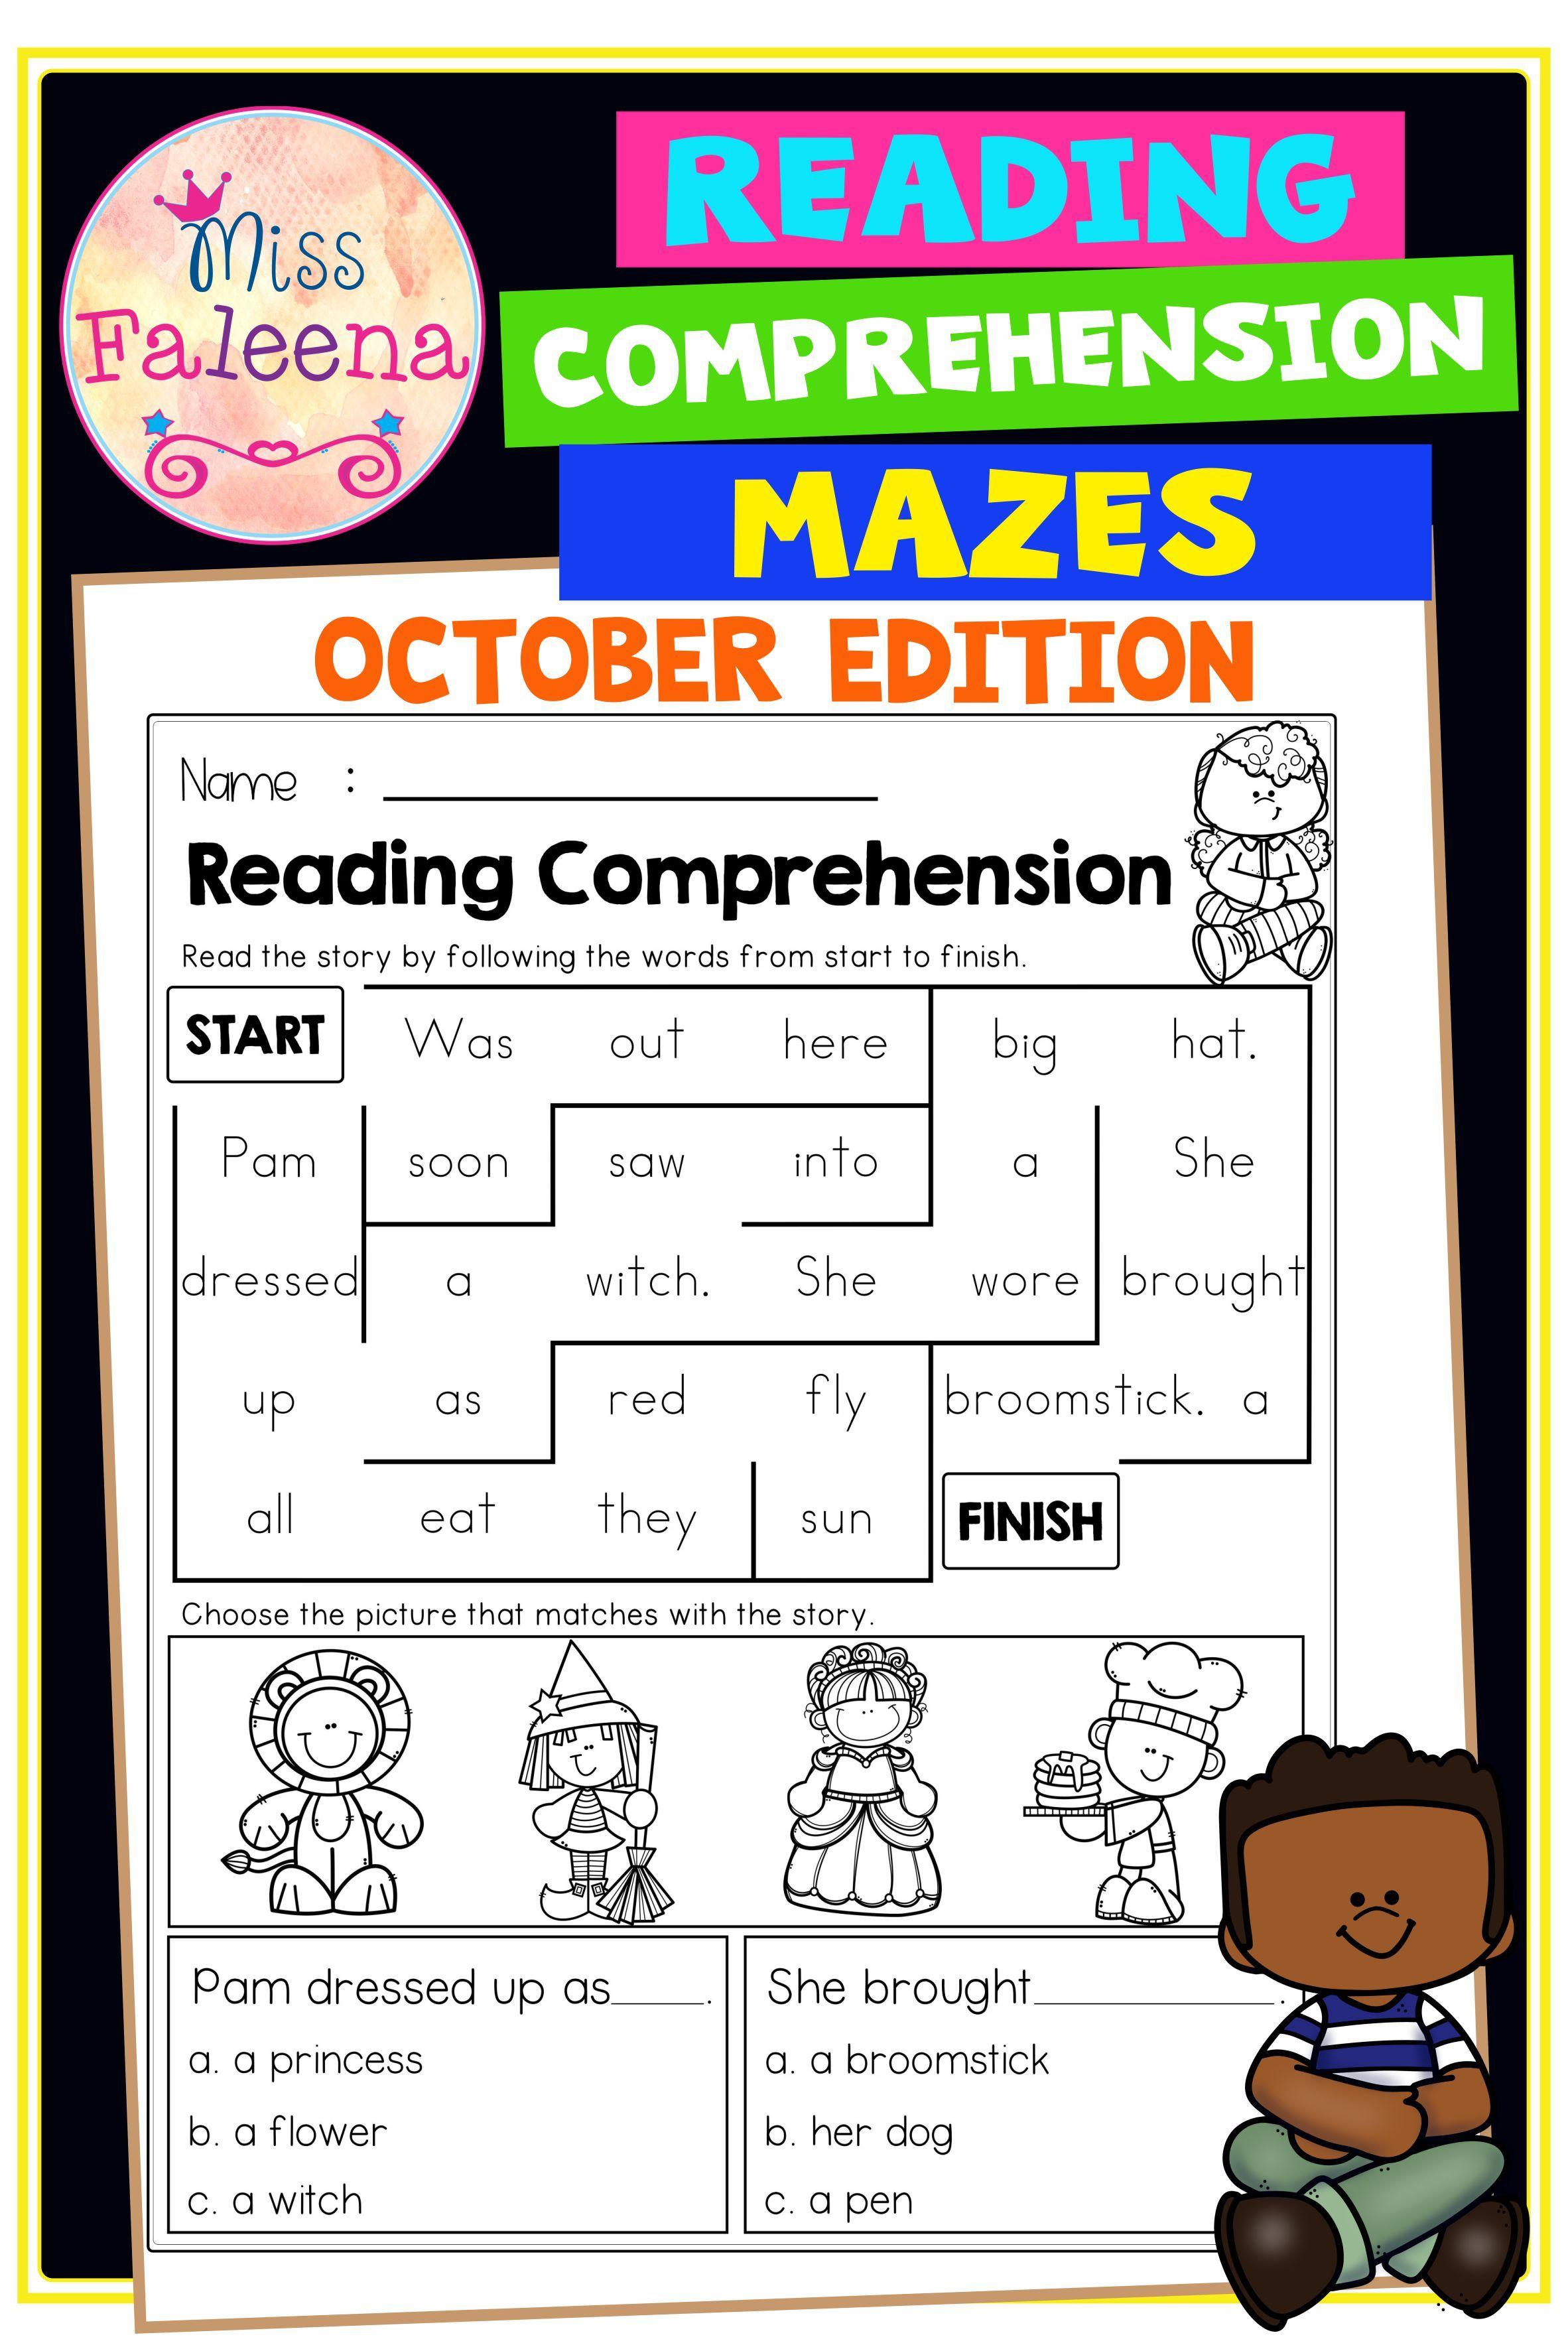 October Reading Comprehension Mazes Reading Comprehension First Grade Reading Comprehension Reading Comprehension Worksheets [ 3544 x 2364 Pixel ]